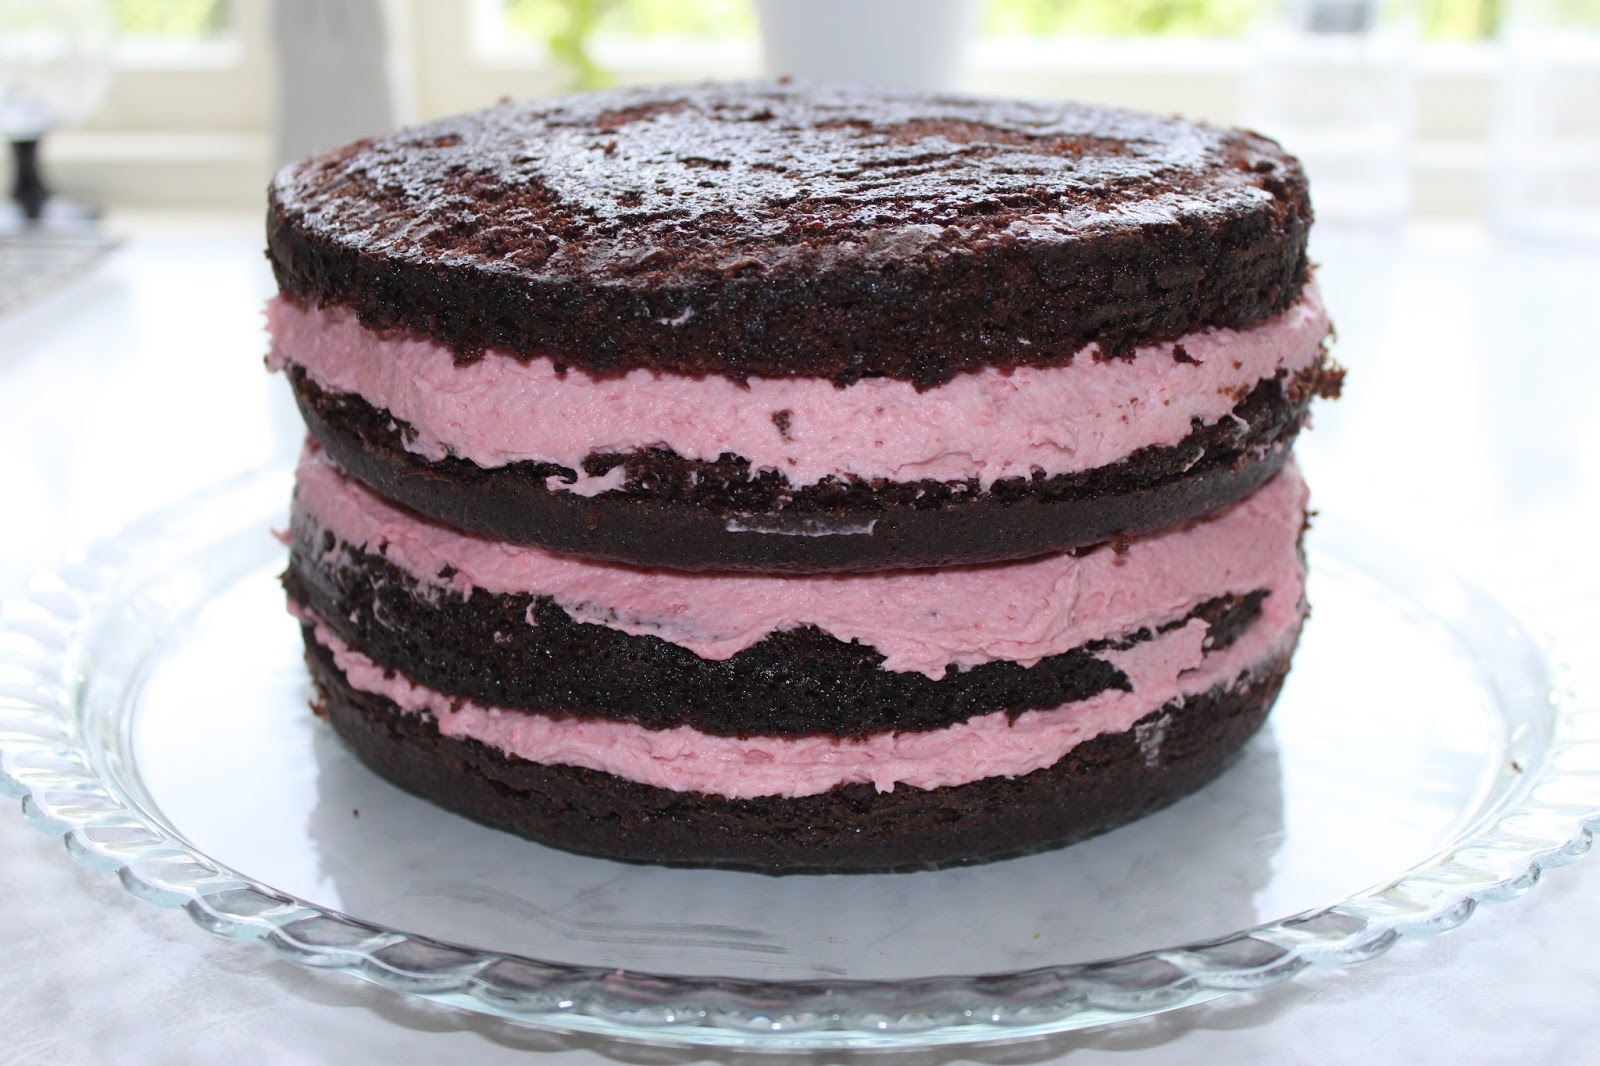 chokladtårta med hallonmousse fyllning